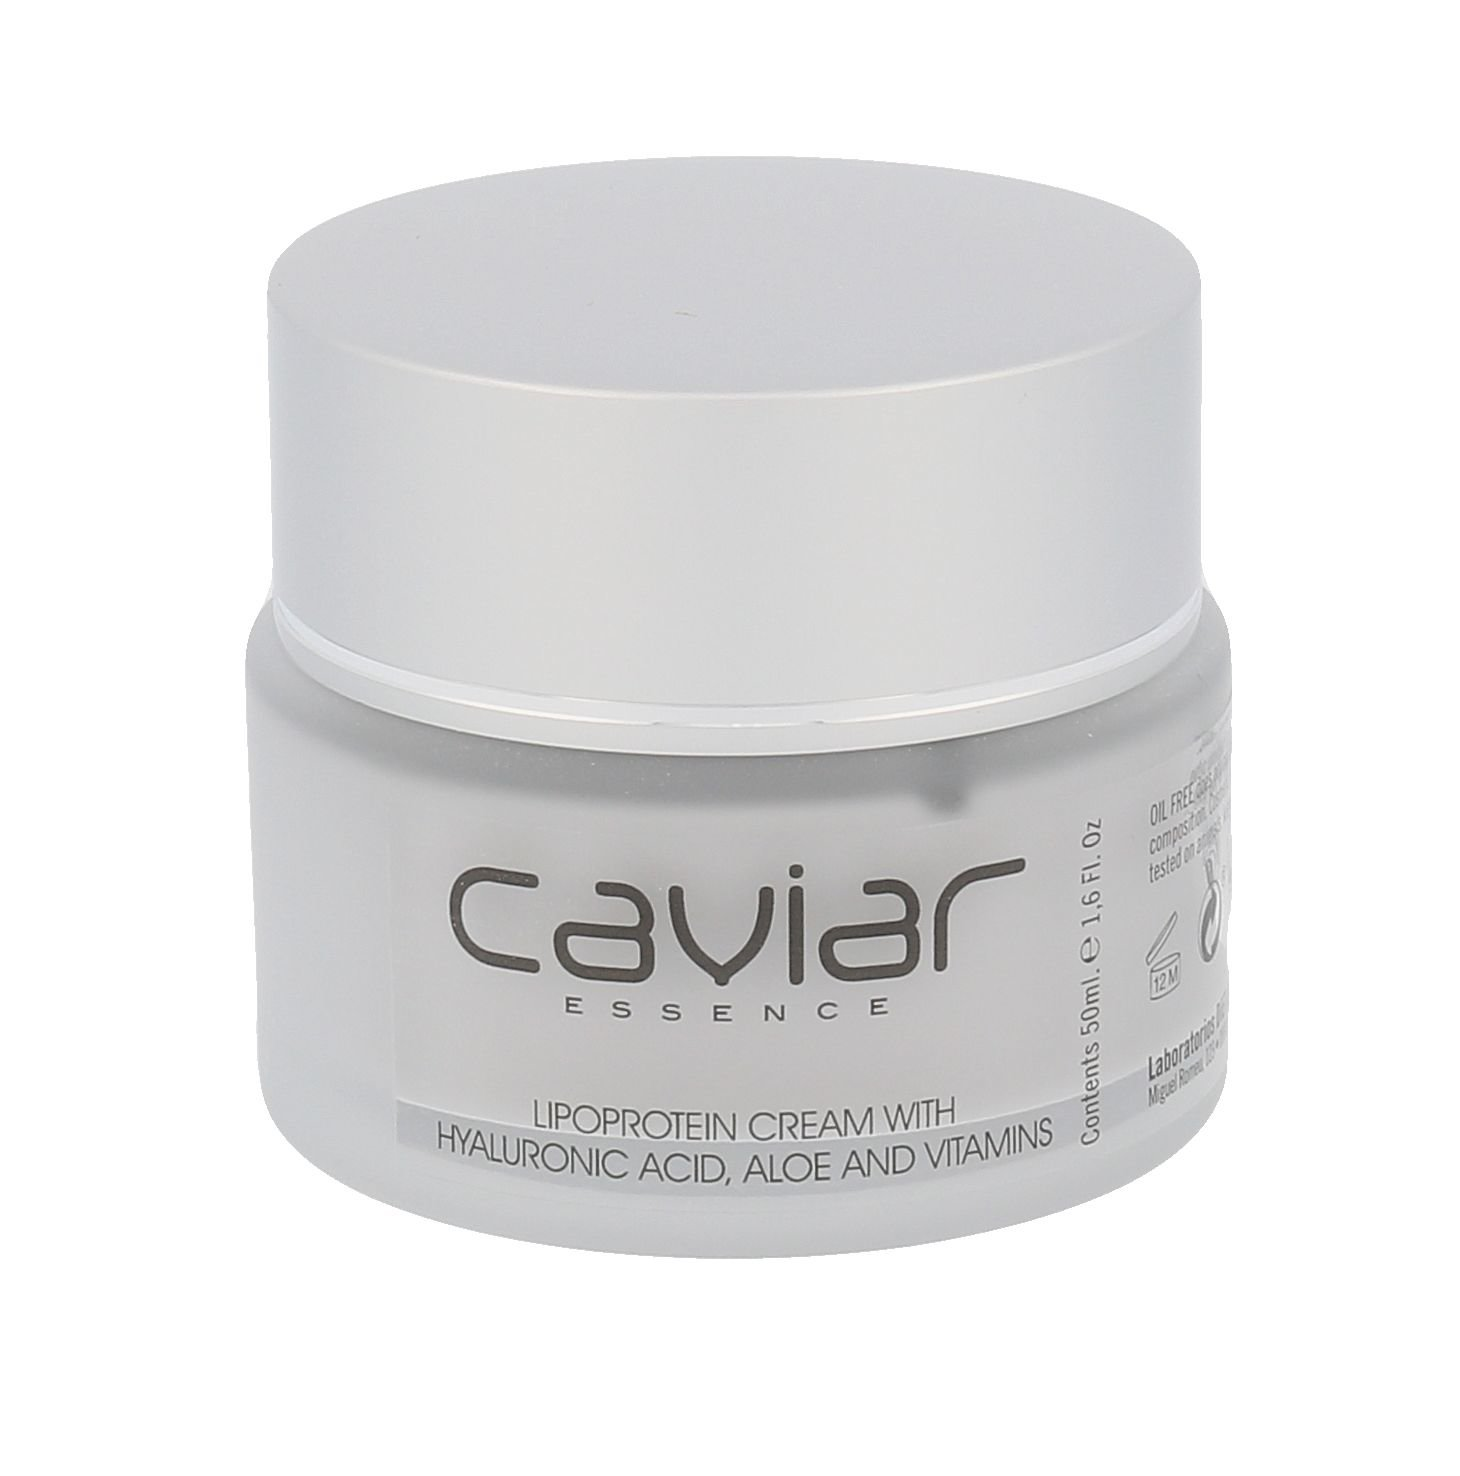 Diet Esthetic Caviar Essence Cream